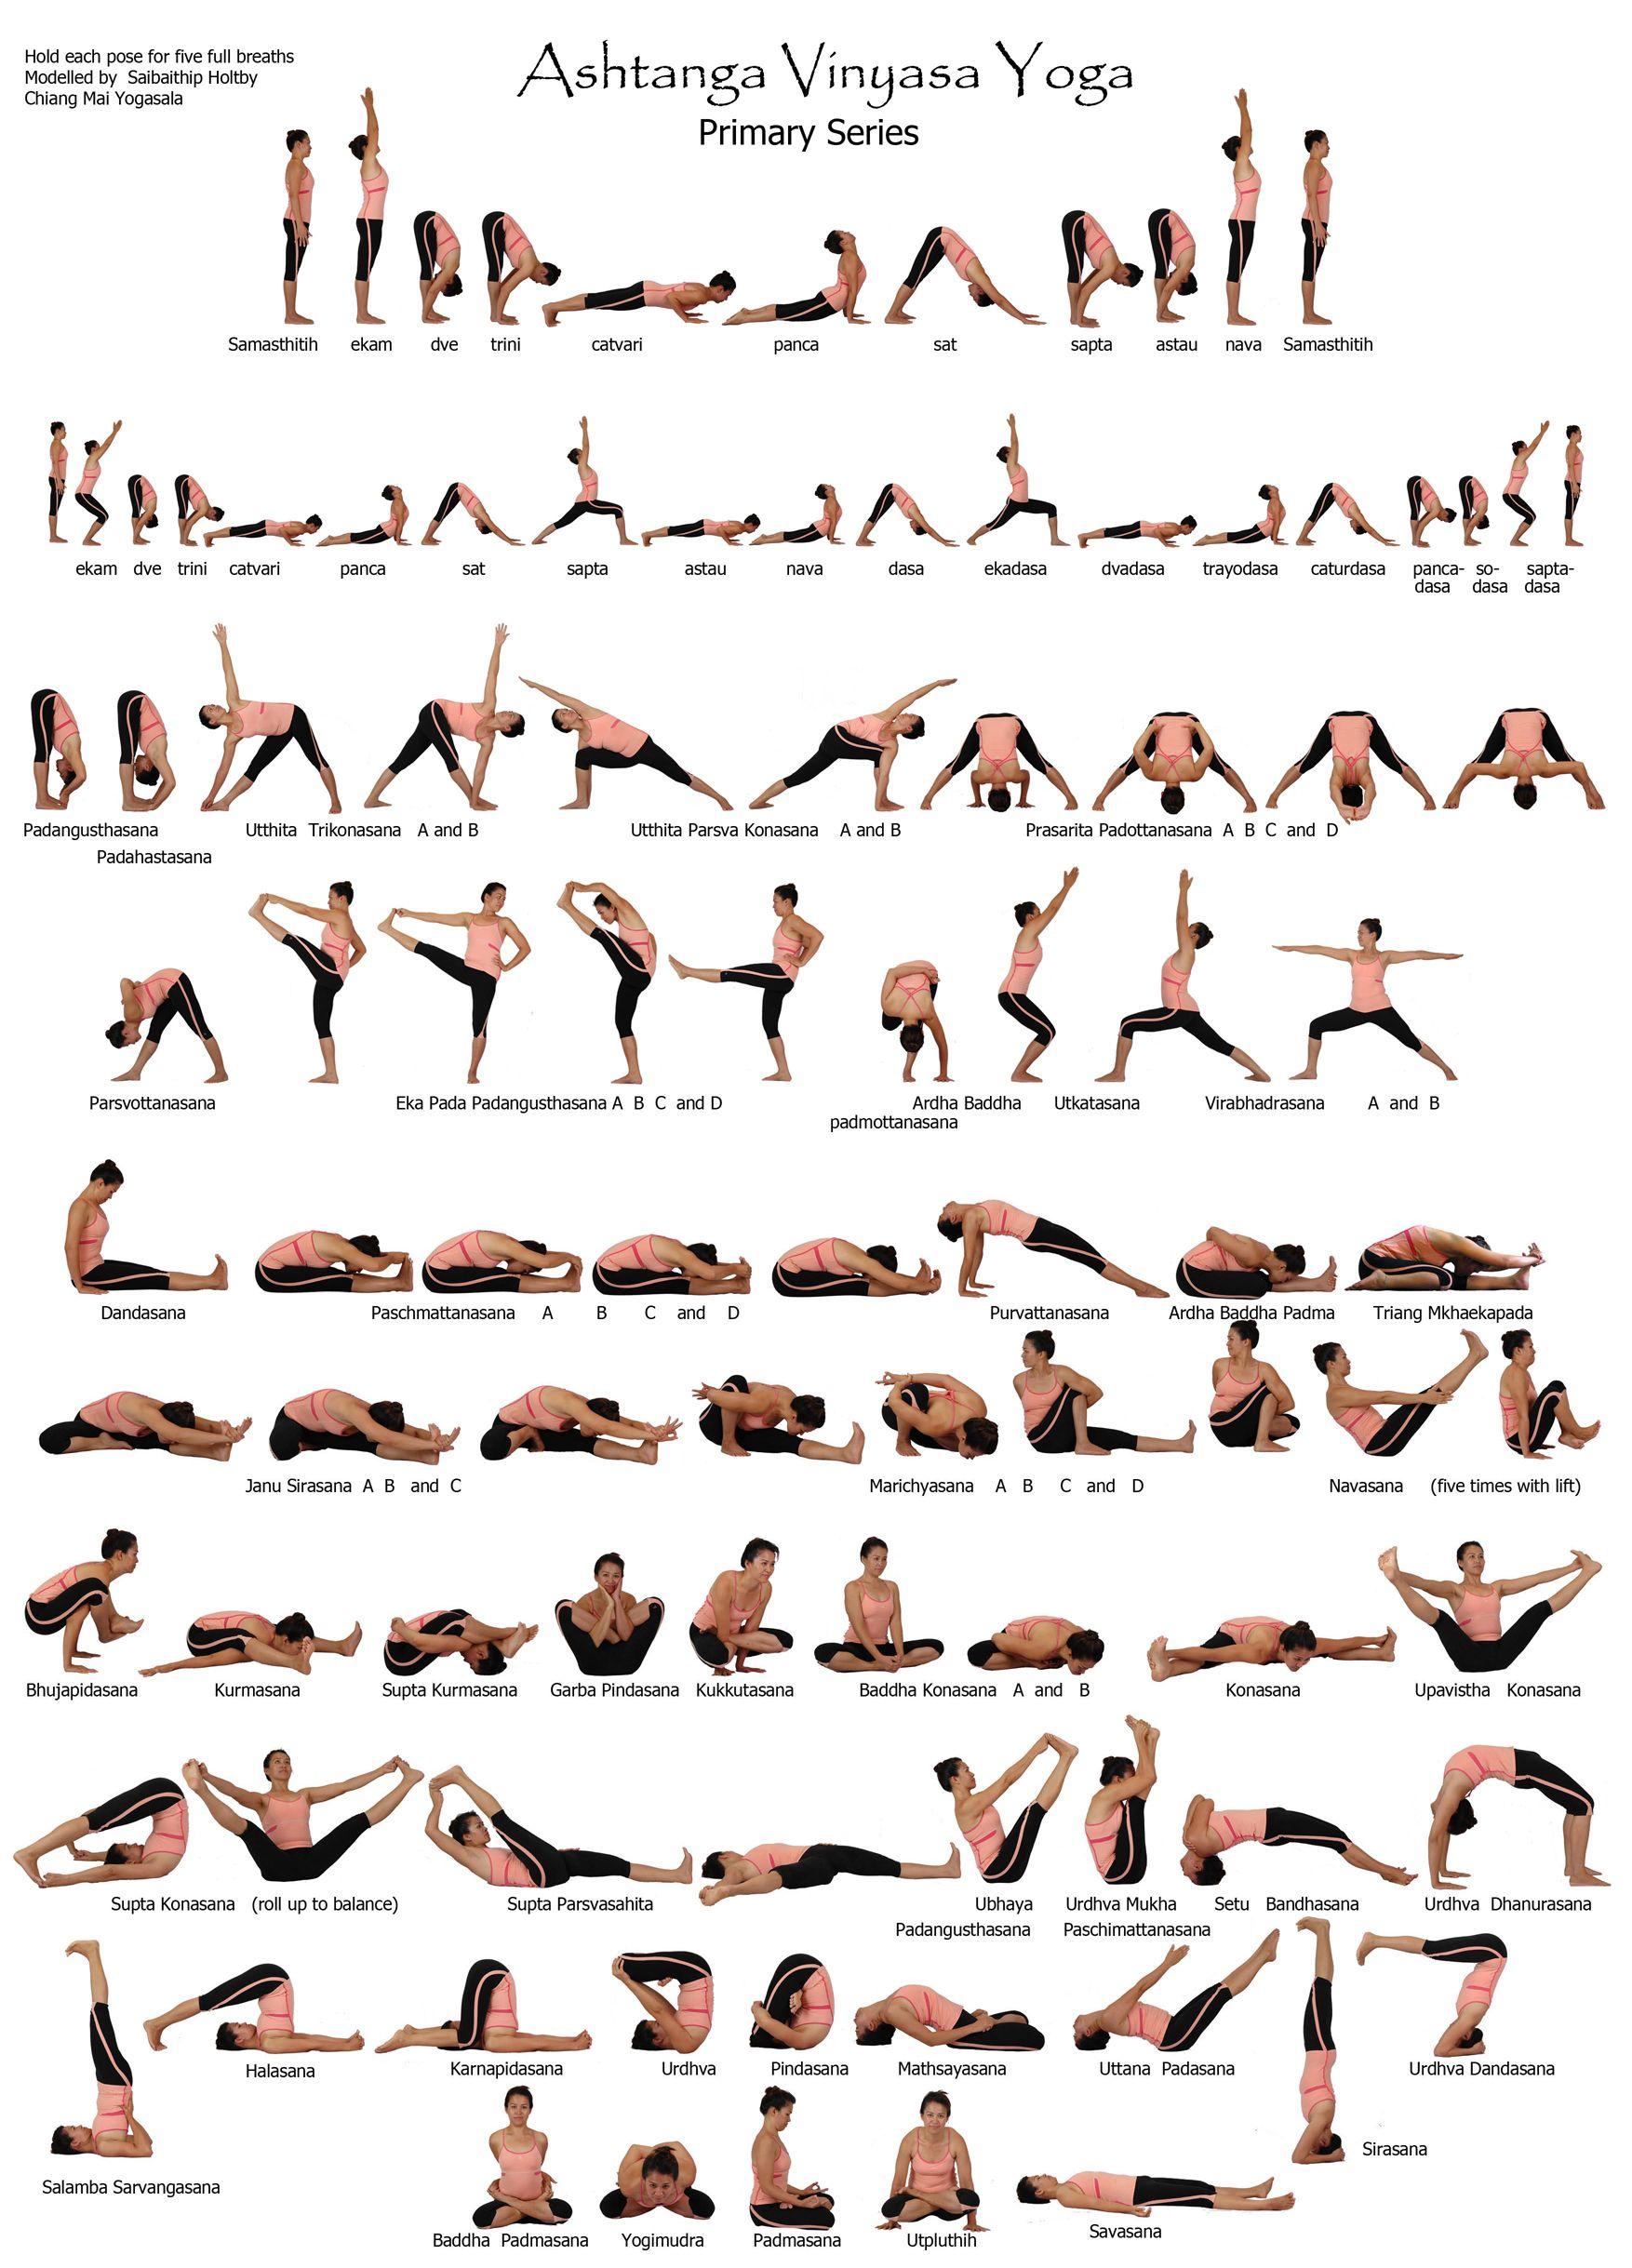 Primary Ashtanga Yoga Series Vinyasa Joga Ashtanga Vinyasa Joga Trenirovki Dlya Mam